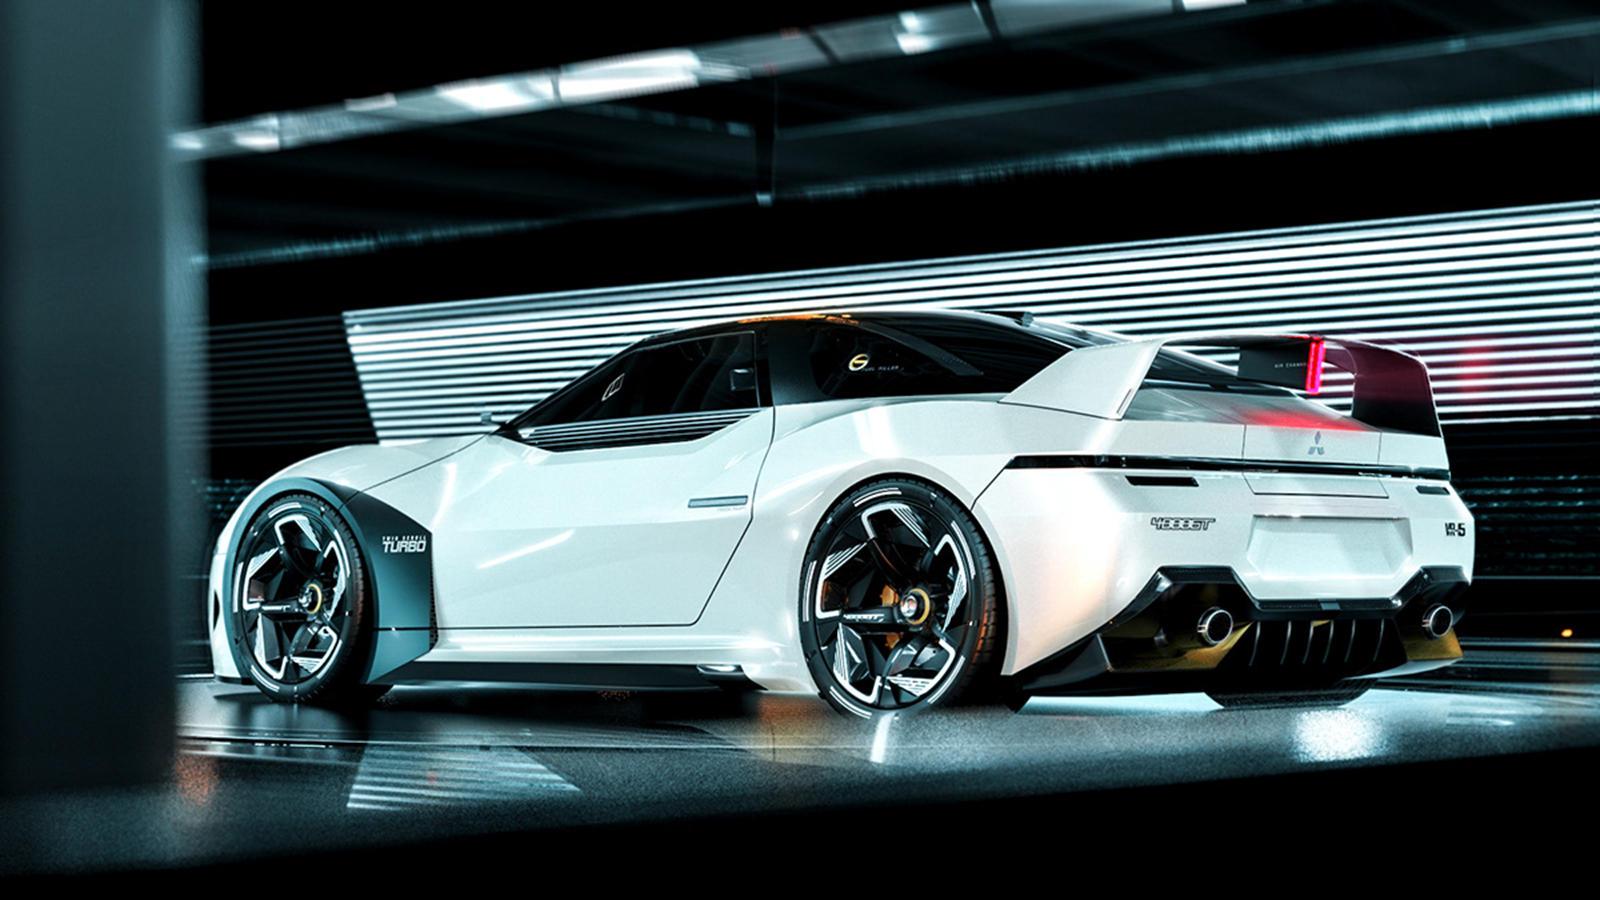 Redesign 2021 Mitsubishi Vr4